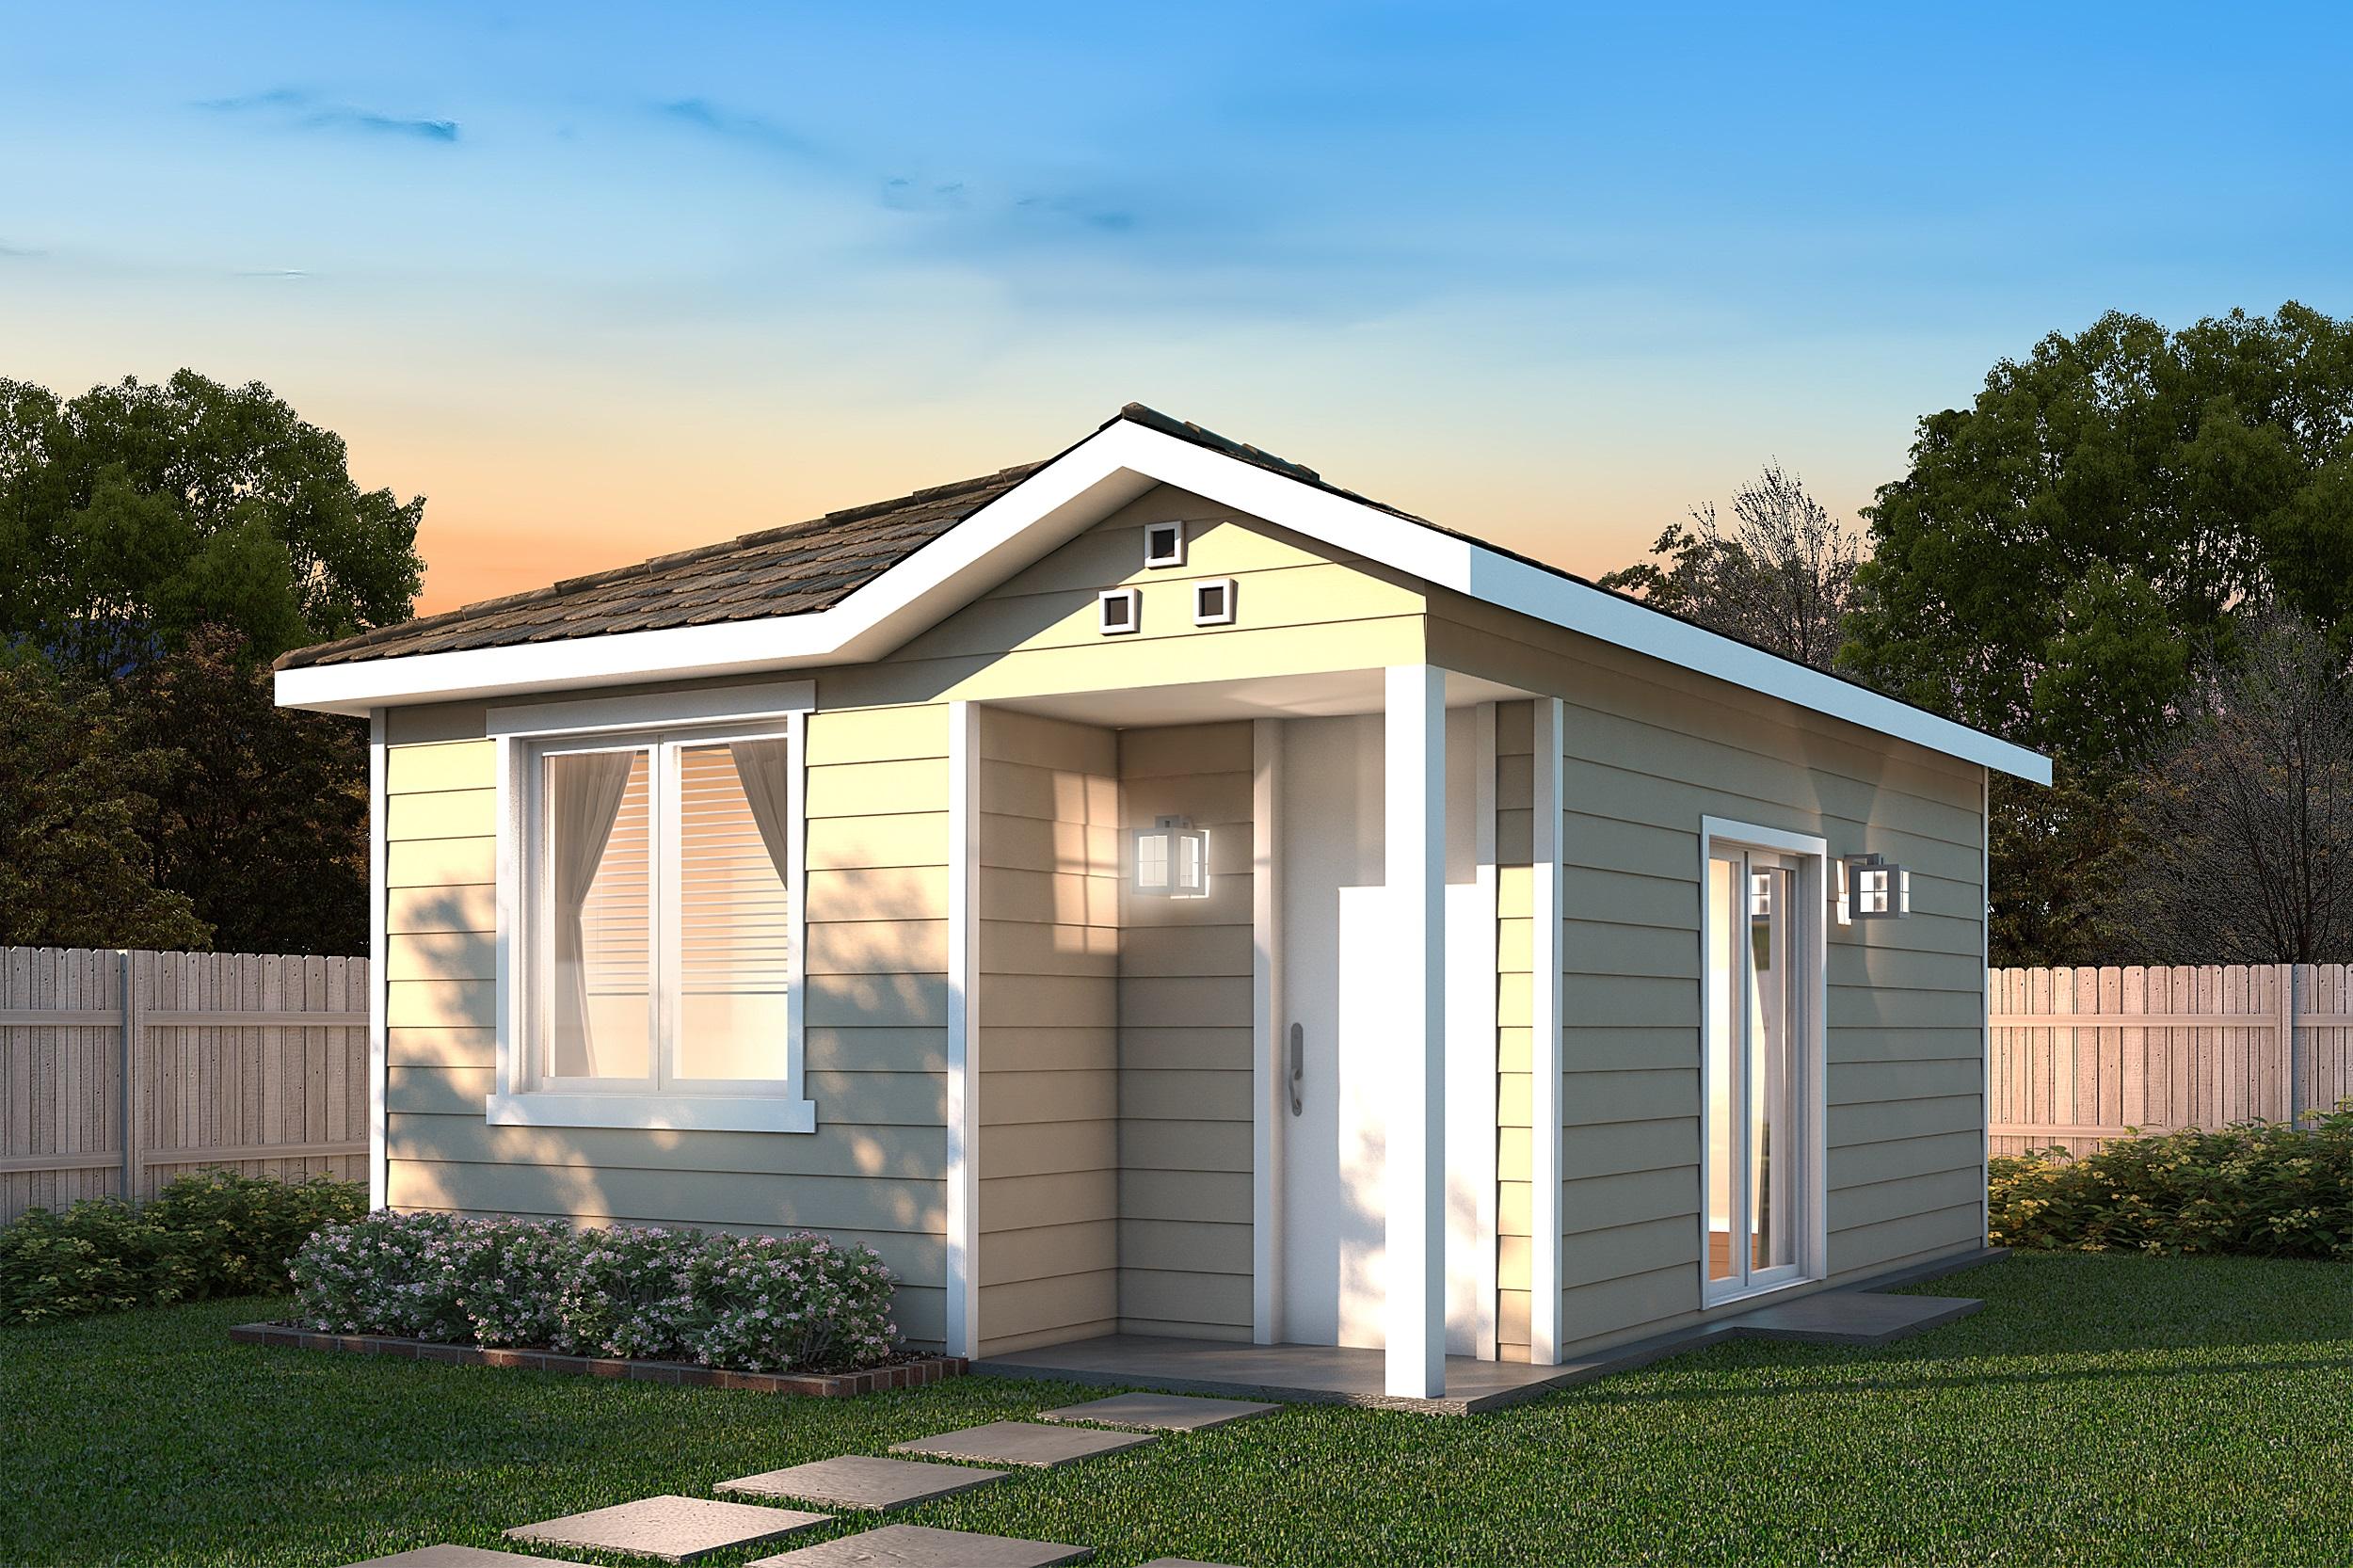 In Law Suite Homes G J Gardner Homes Debuts 10 New Granny Flat Designs